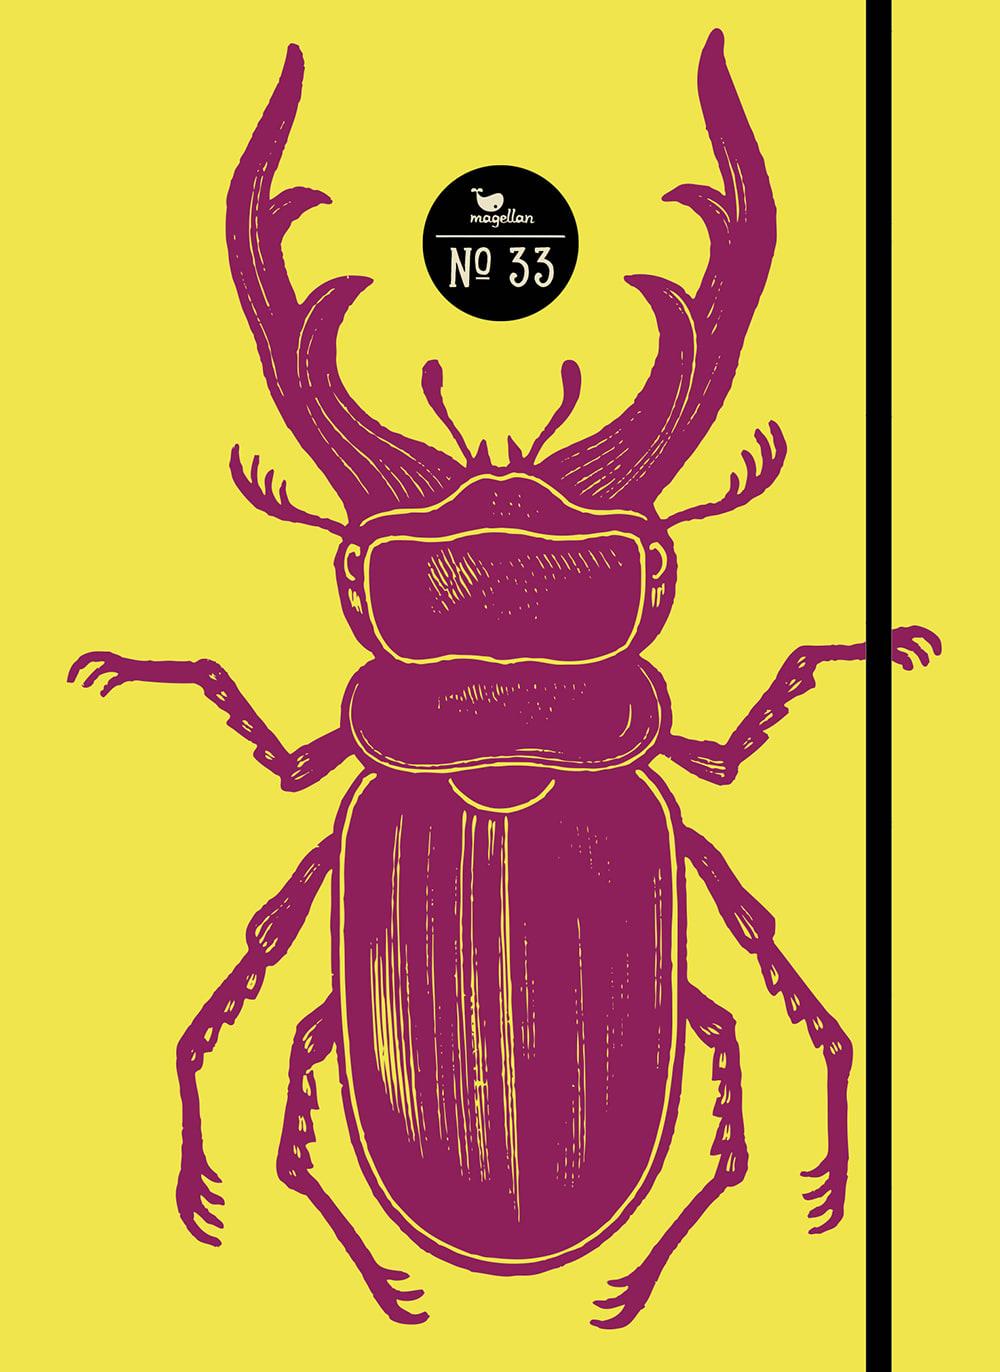 Notizbuch No. 33 - Käfer